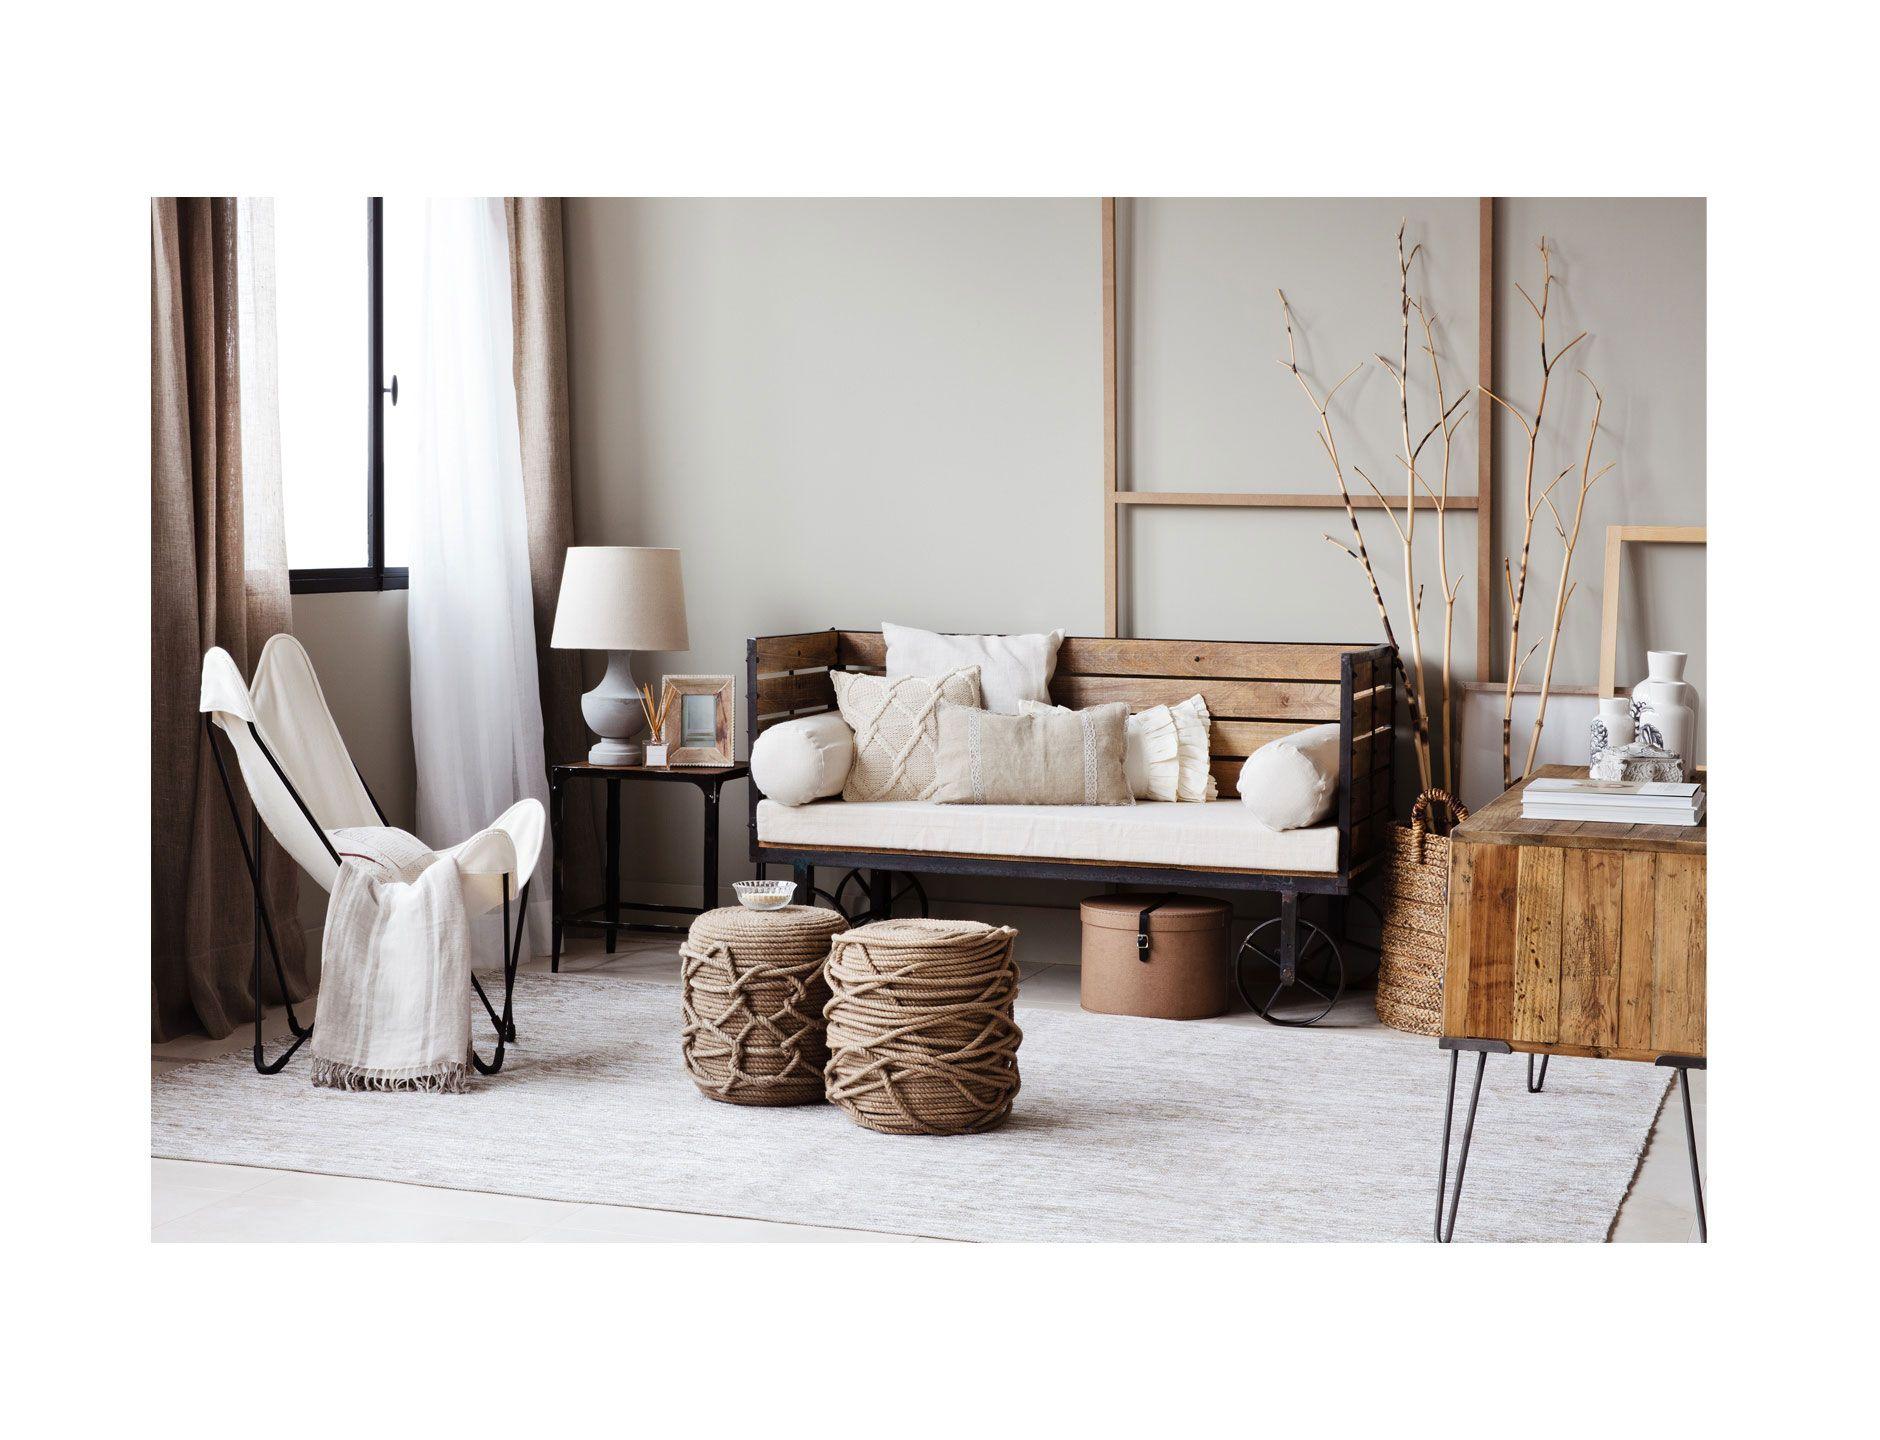 Remarkable Zarahome Ma Maison Zara Home Home Furnishings Home Download Free Architecture Designs Rallybritishbridgeorg